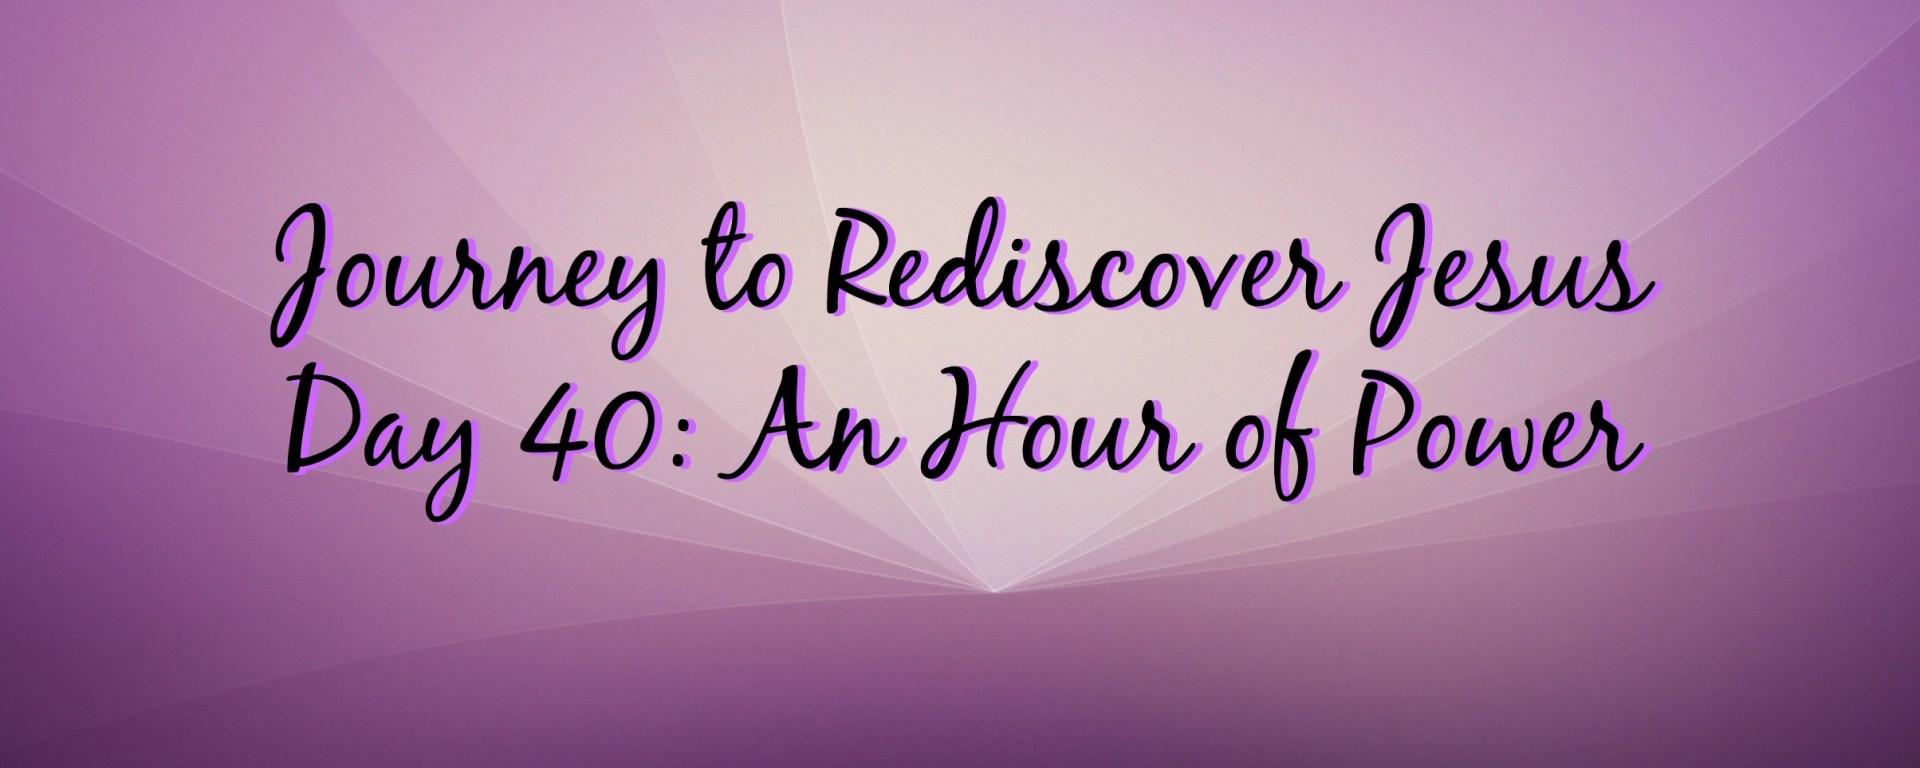 journey to rediscover jesus